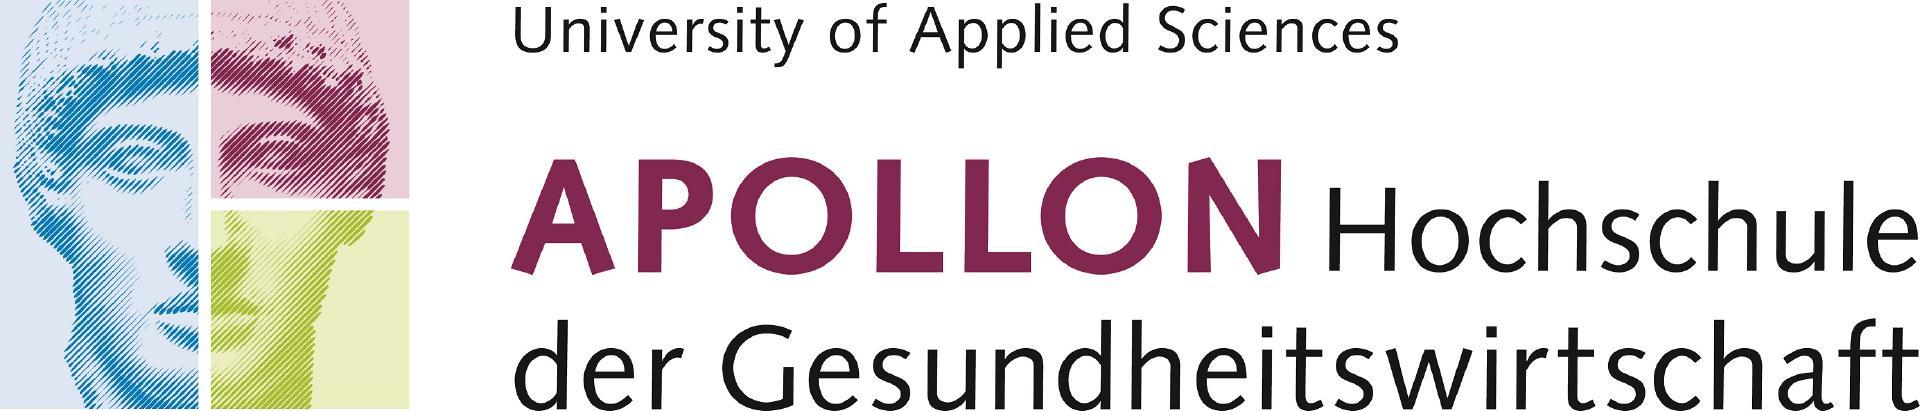 APOLLON Hochschule CMYK klein 002